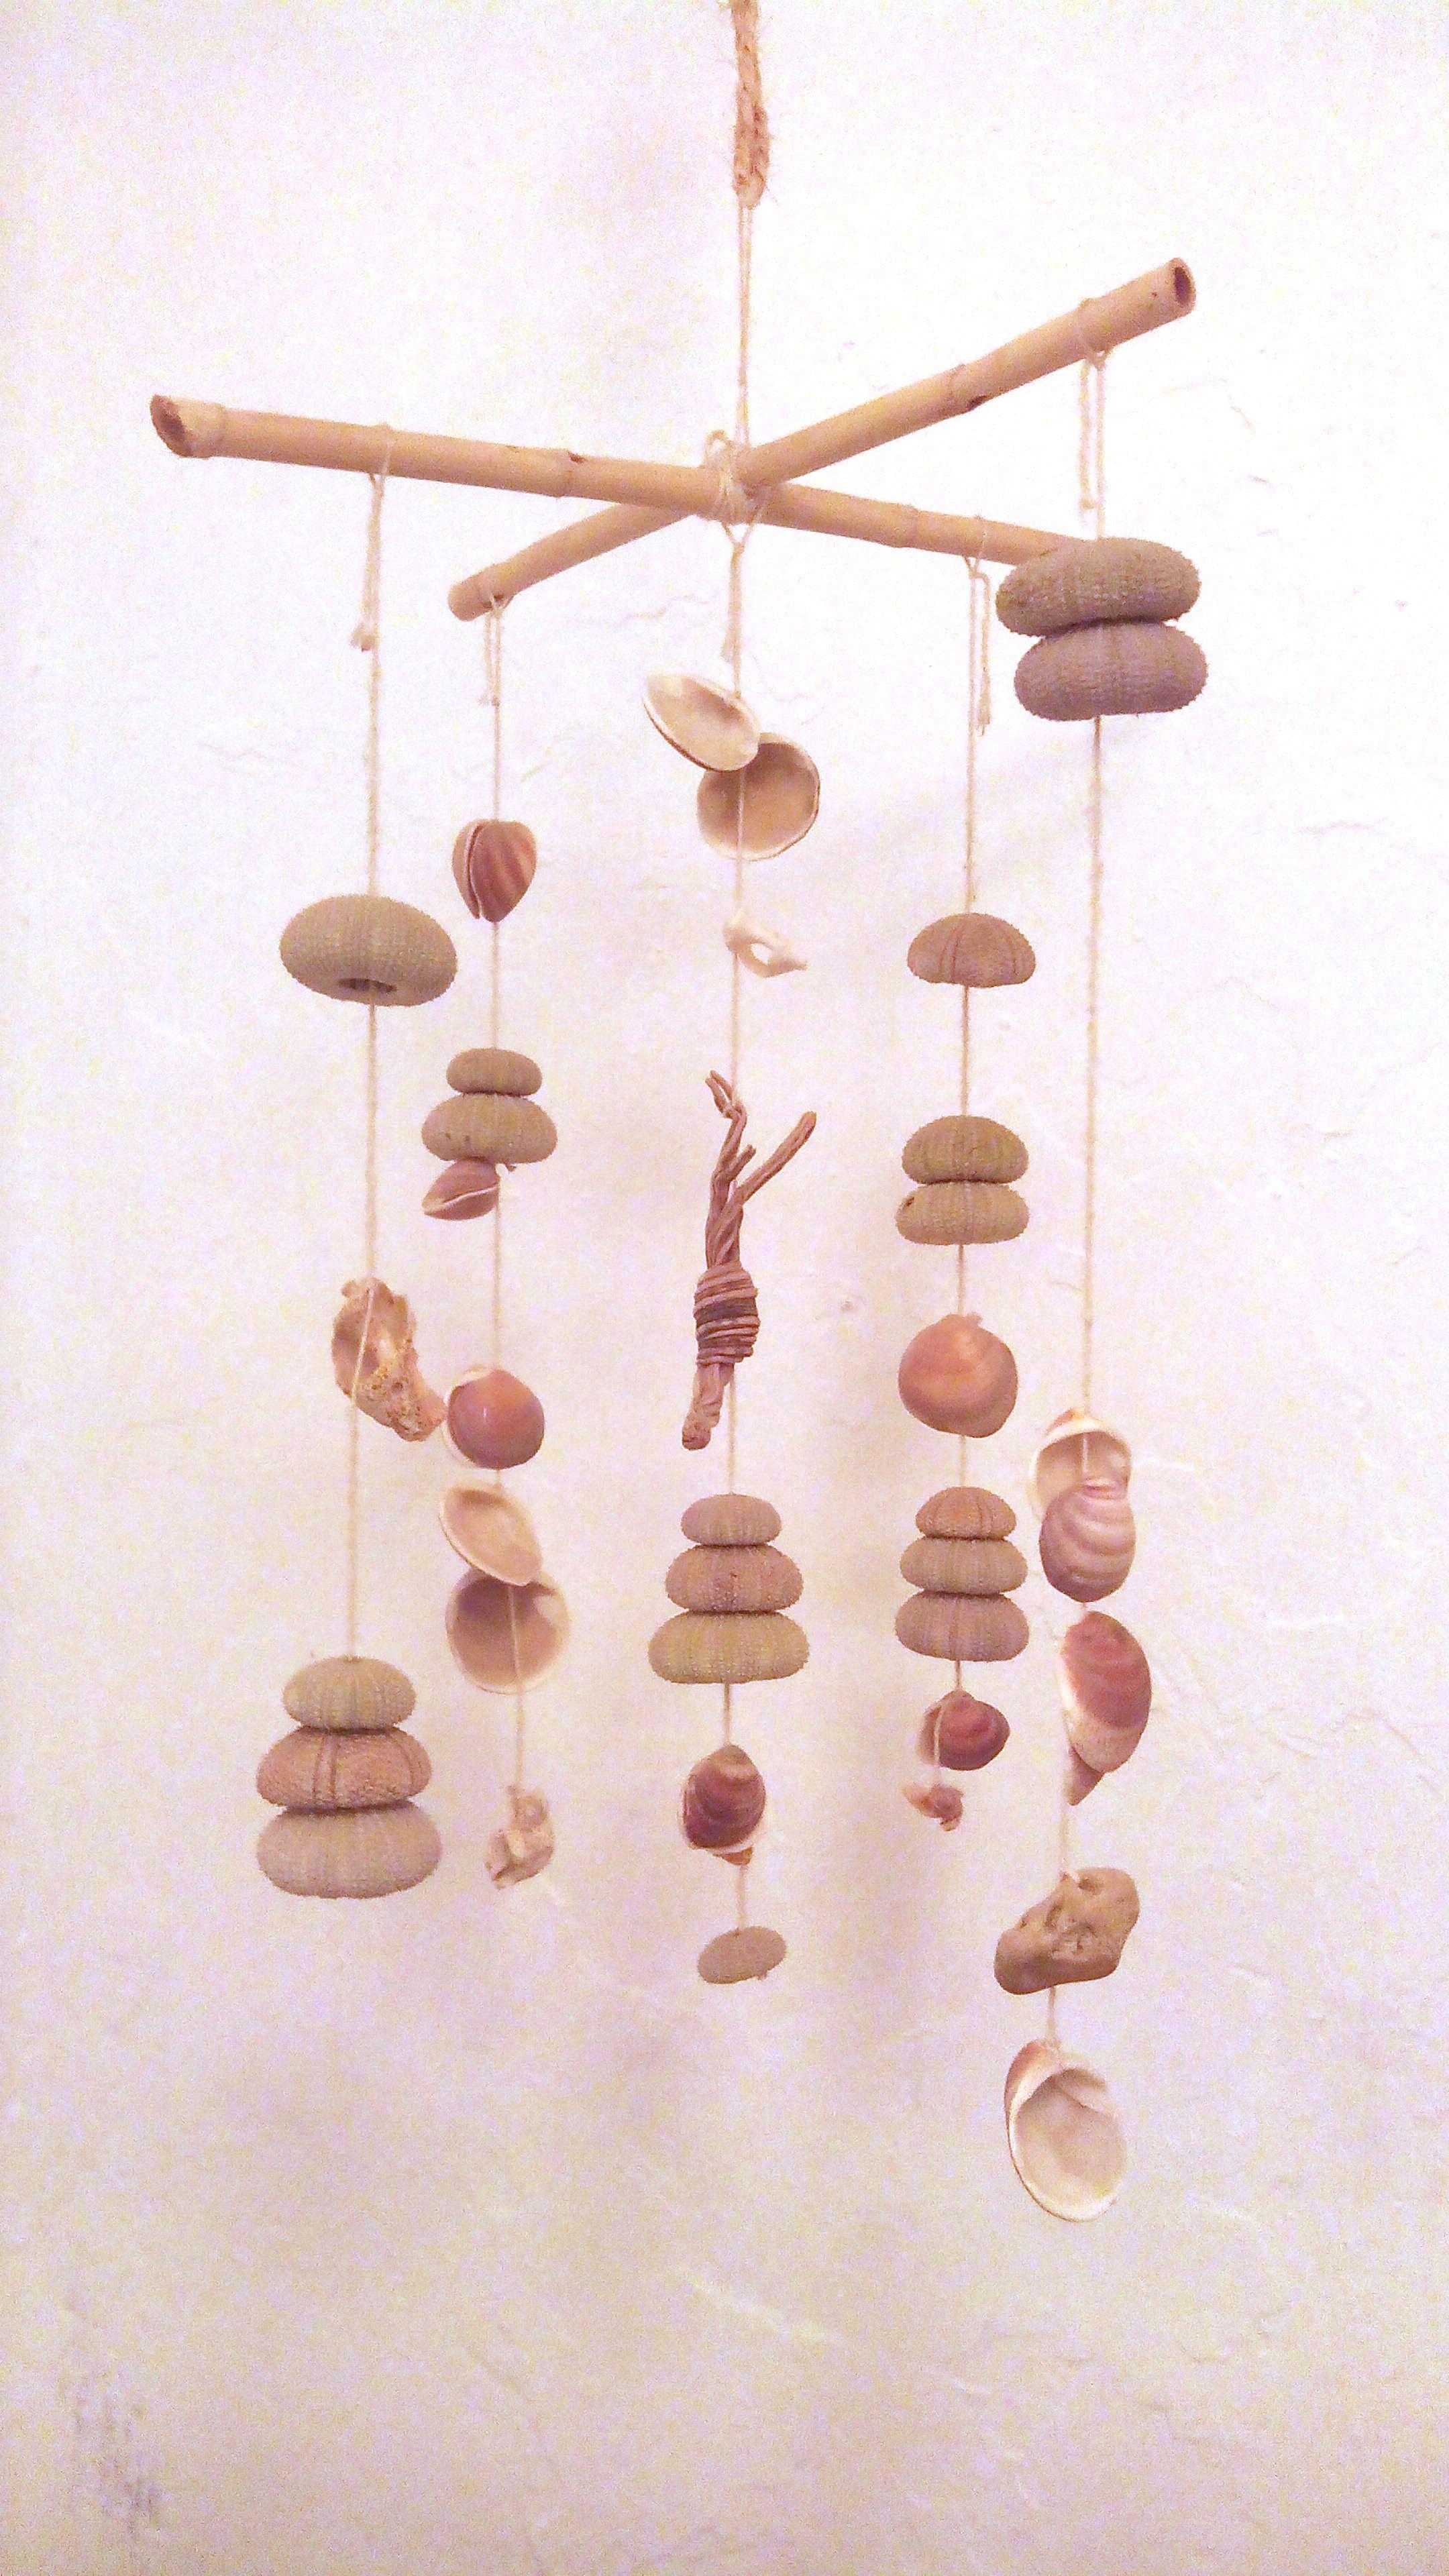 movil-conchas-erizos-handmade-casacueva-adoraideas